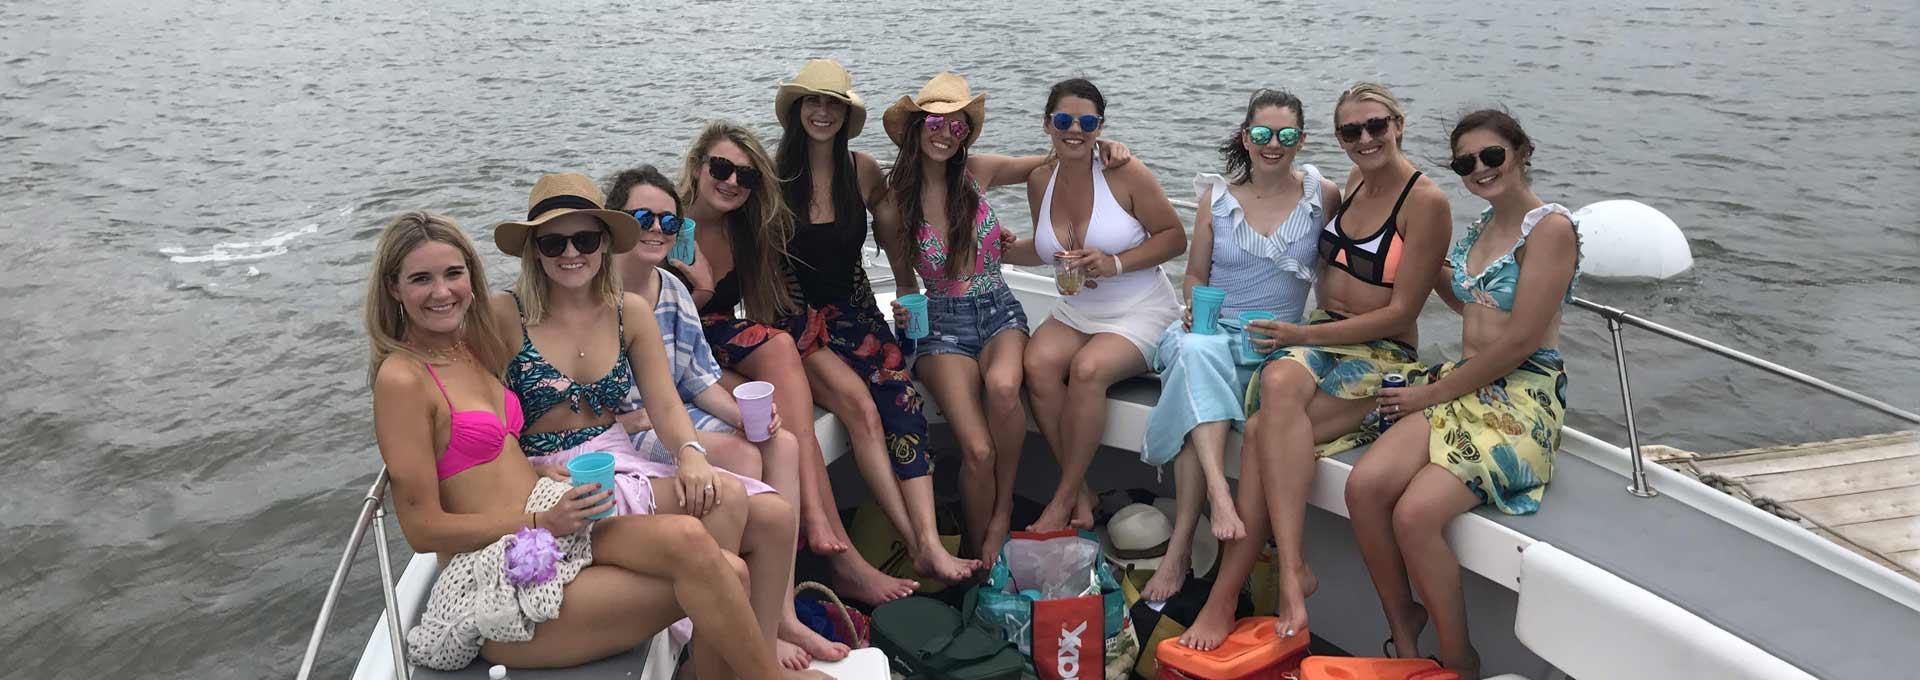 Bachelorette Party Cruises Charleston Sc Bachelor